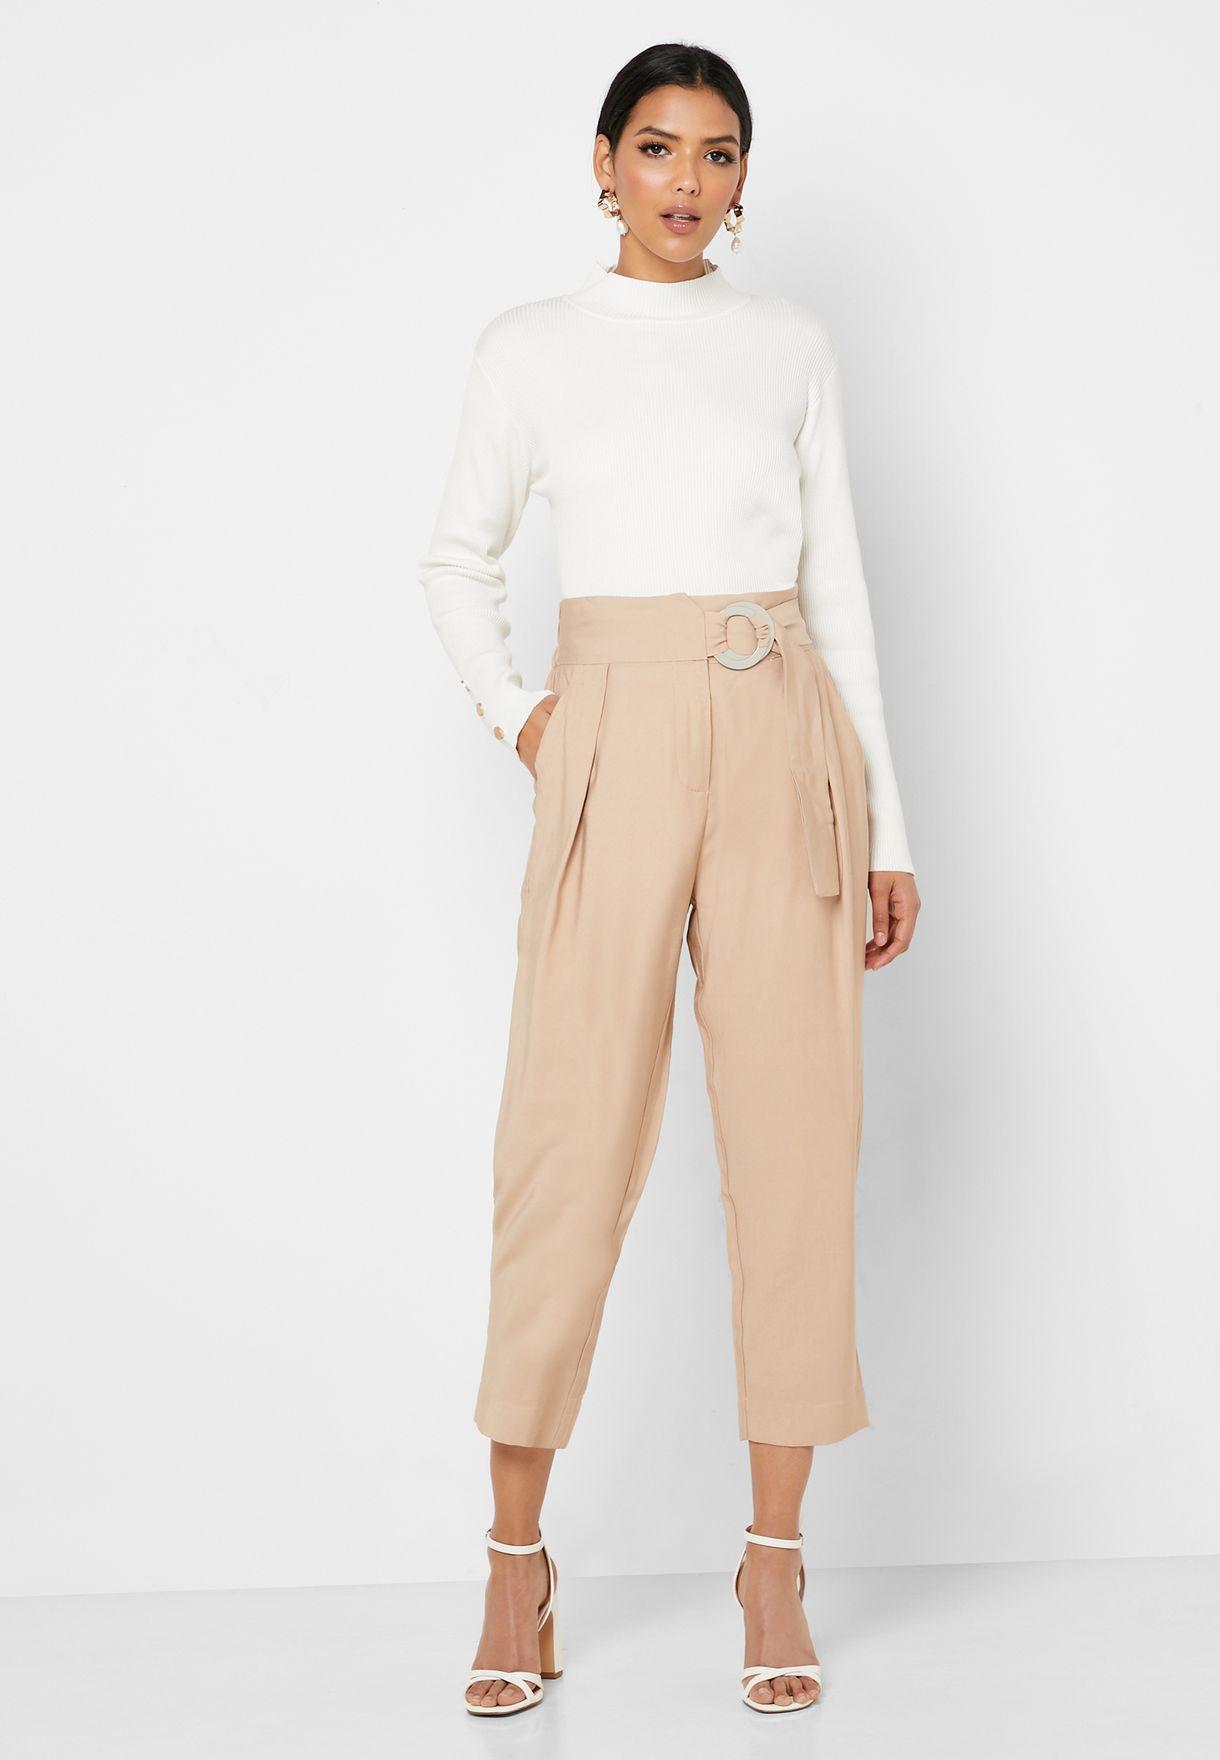 Buckle Detail Pants